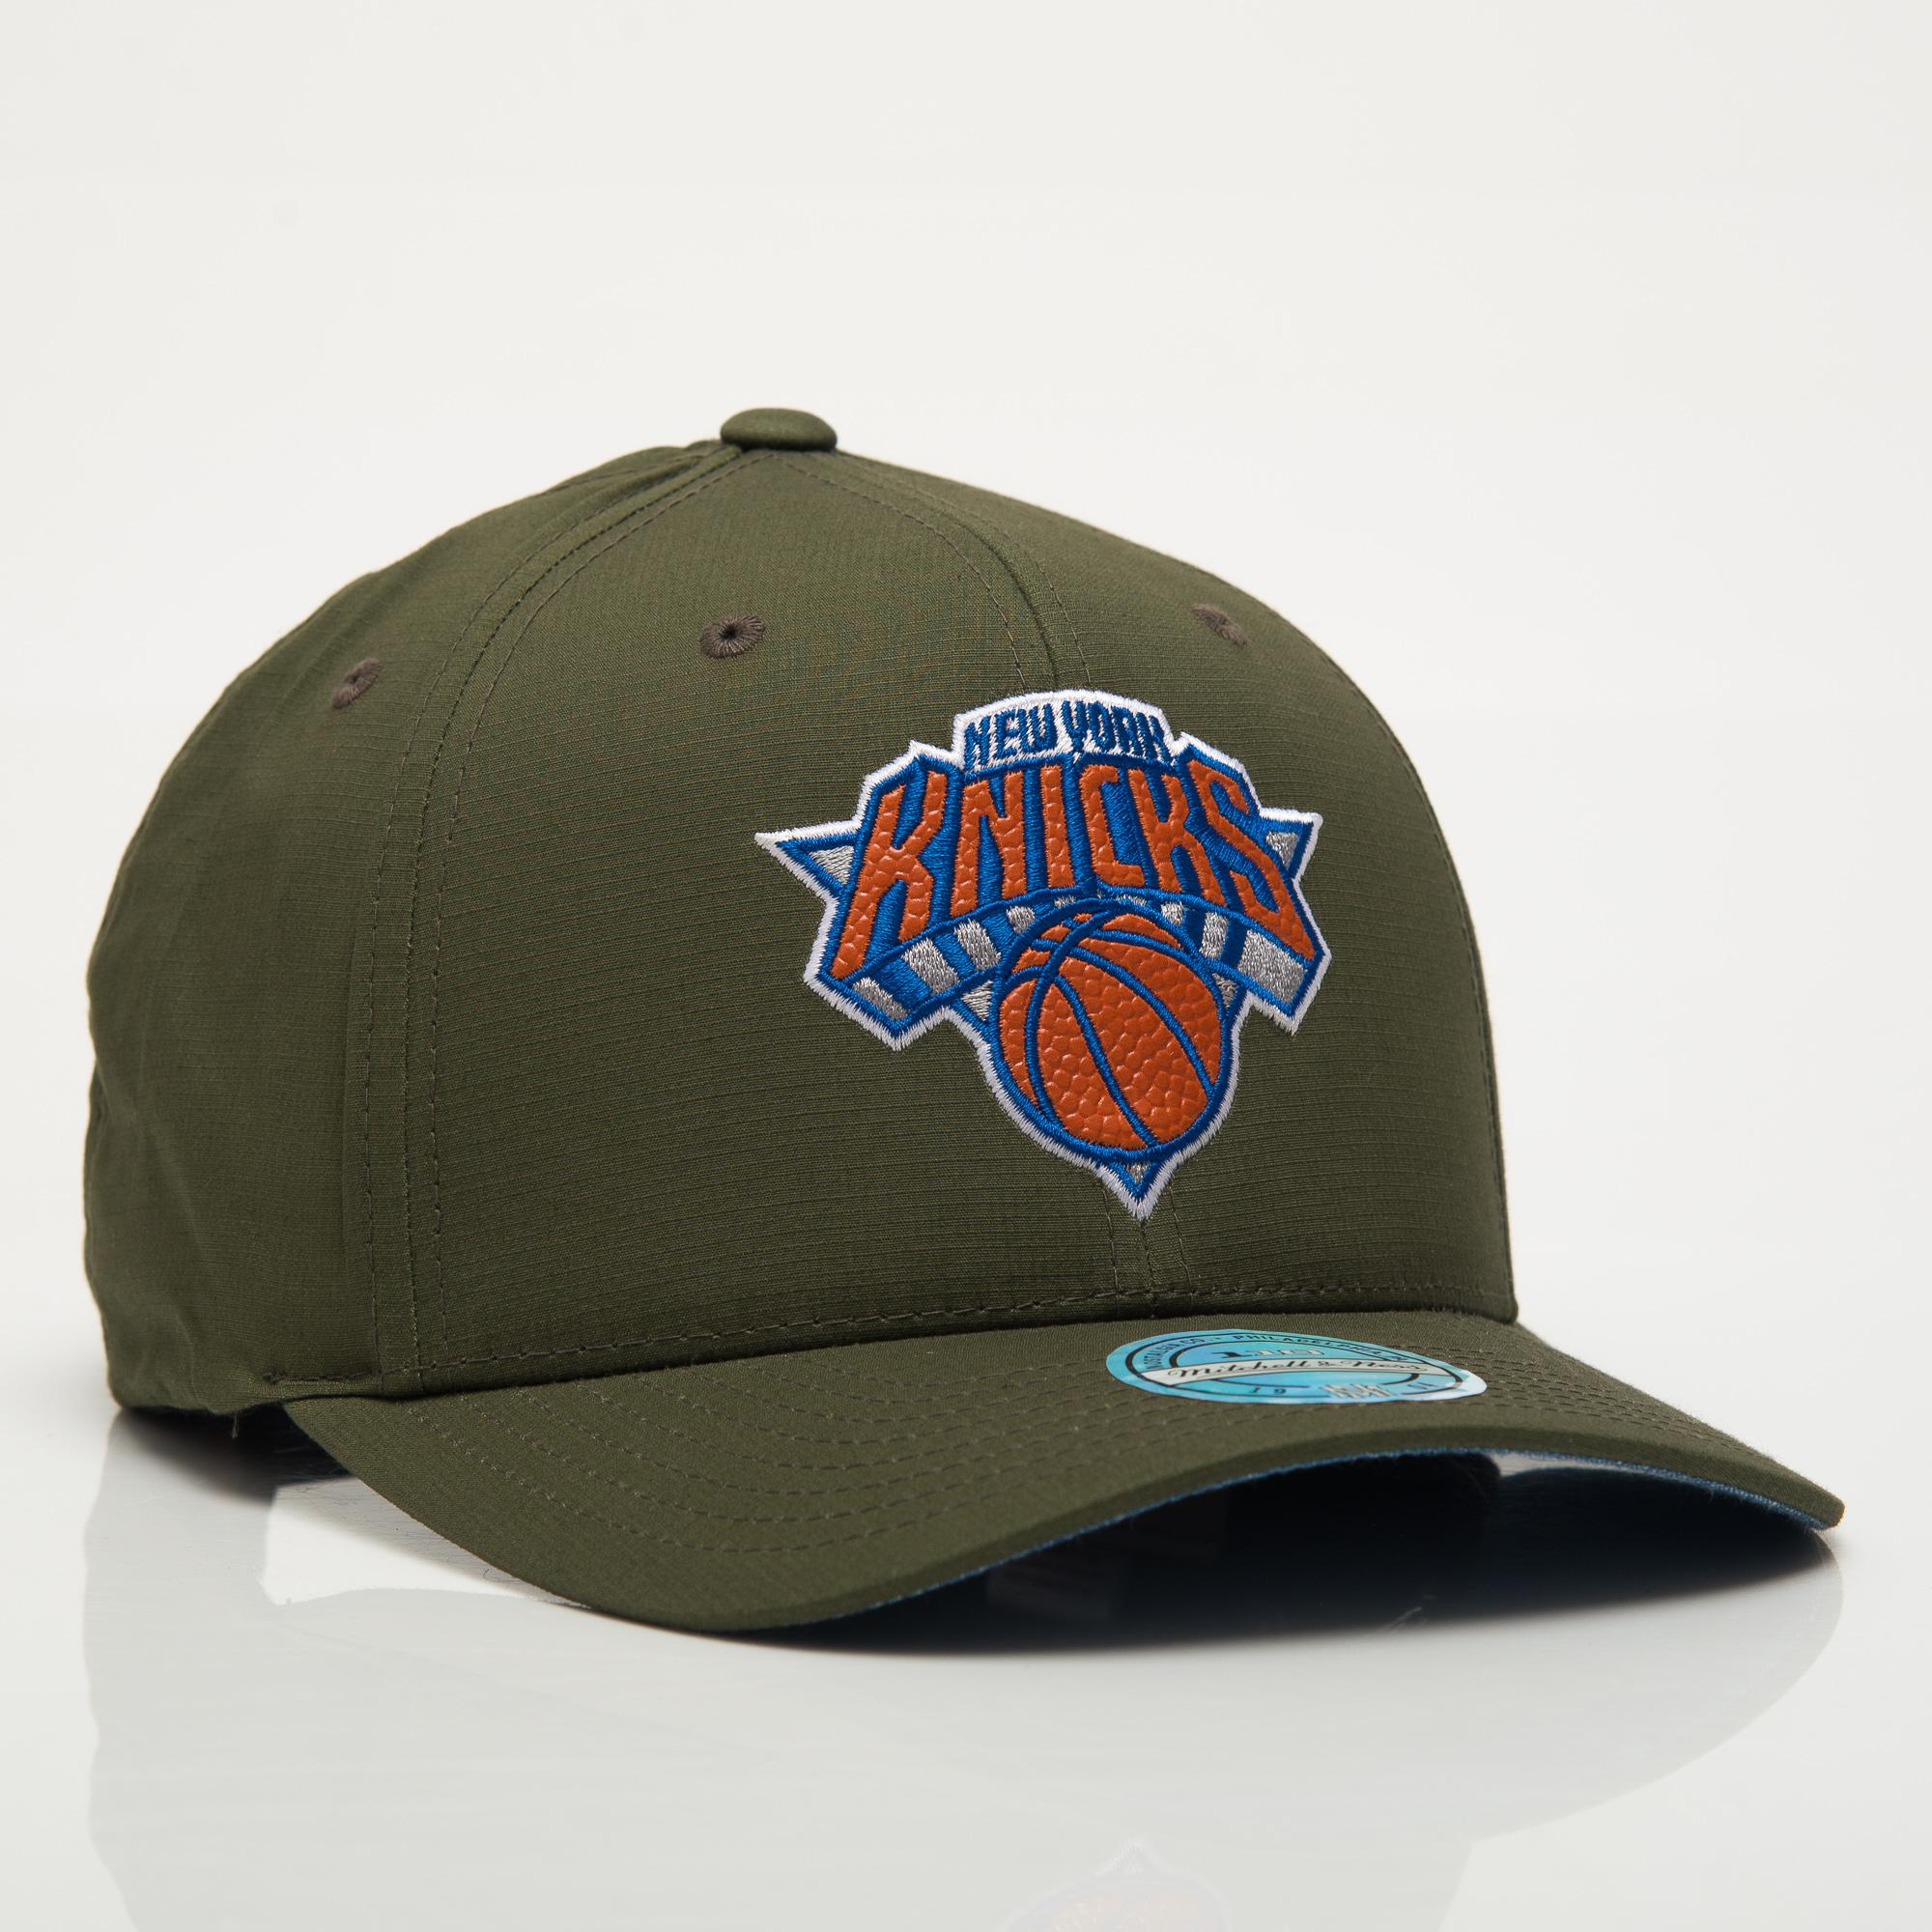 60009566 Mitchell & Ness NBA New York Knicks Battle Snapback Cap - NBA Shop New York  Knicks Merchandise - Superfanas.lt